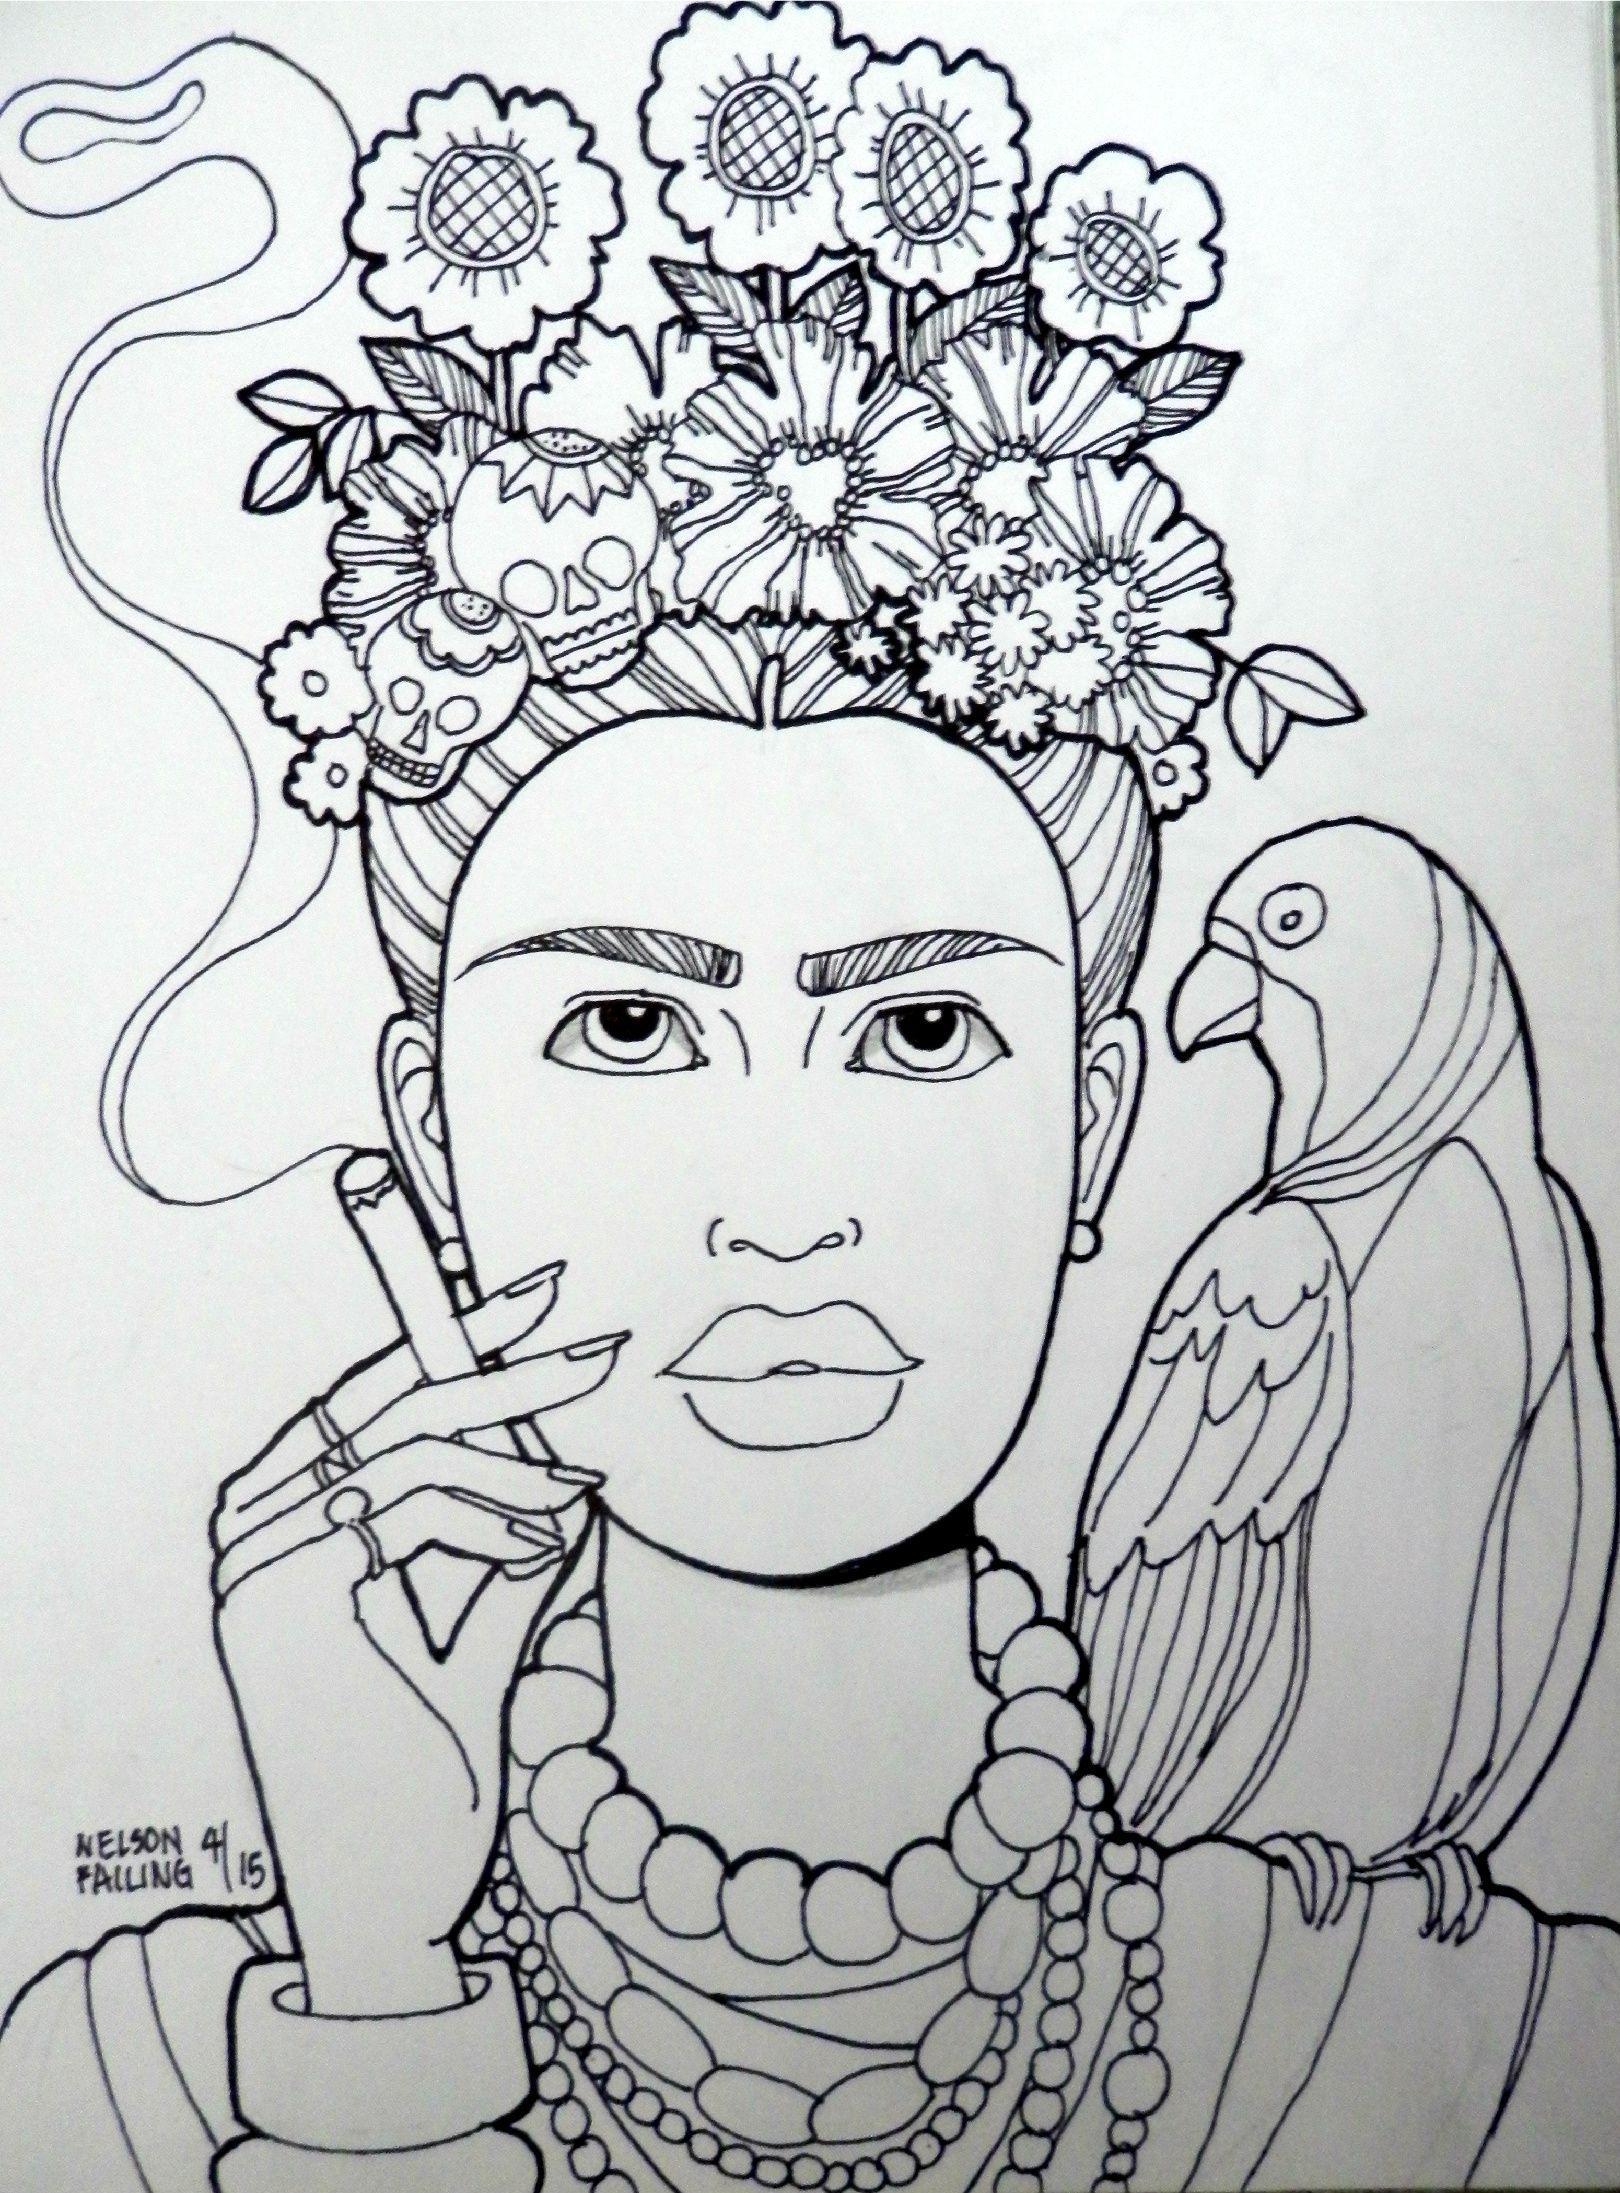 Frida Kahlo Nelson Failing The Art Colony Frida Kahlo